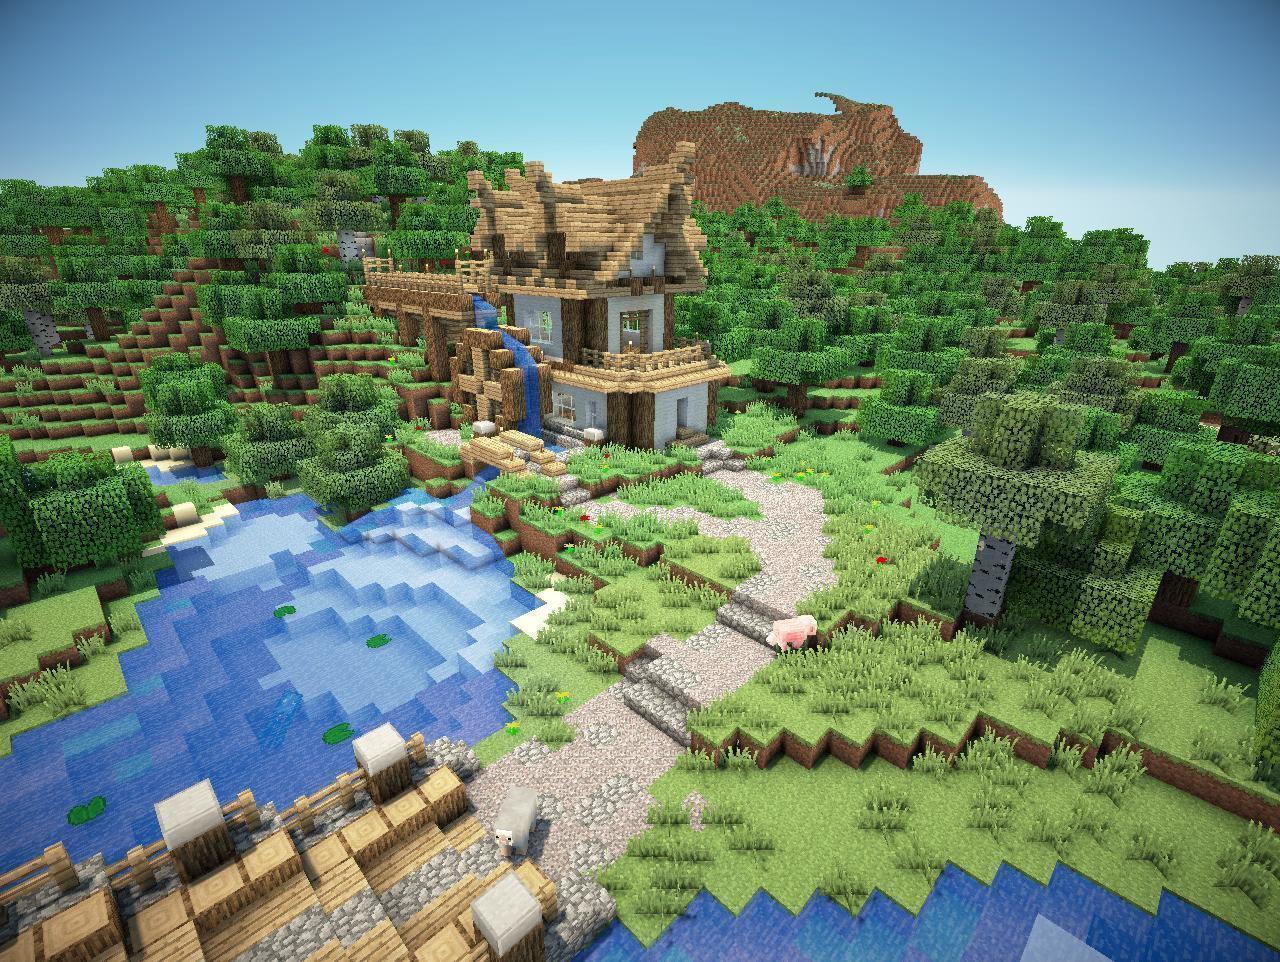 R3D CRAFT [128x] текстуры для Minecraft 1.6.2: minecrafted.su/texture-packs/16/656-r3d-craft-x128-tekstury-dlya...